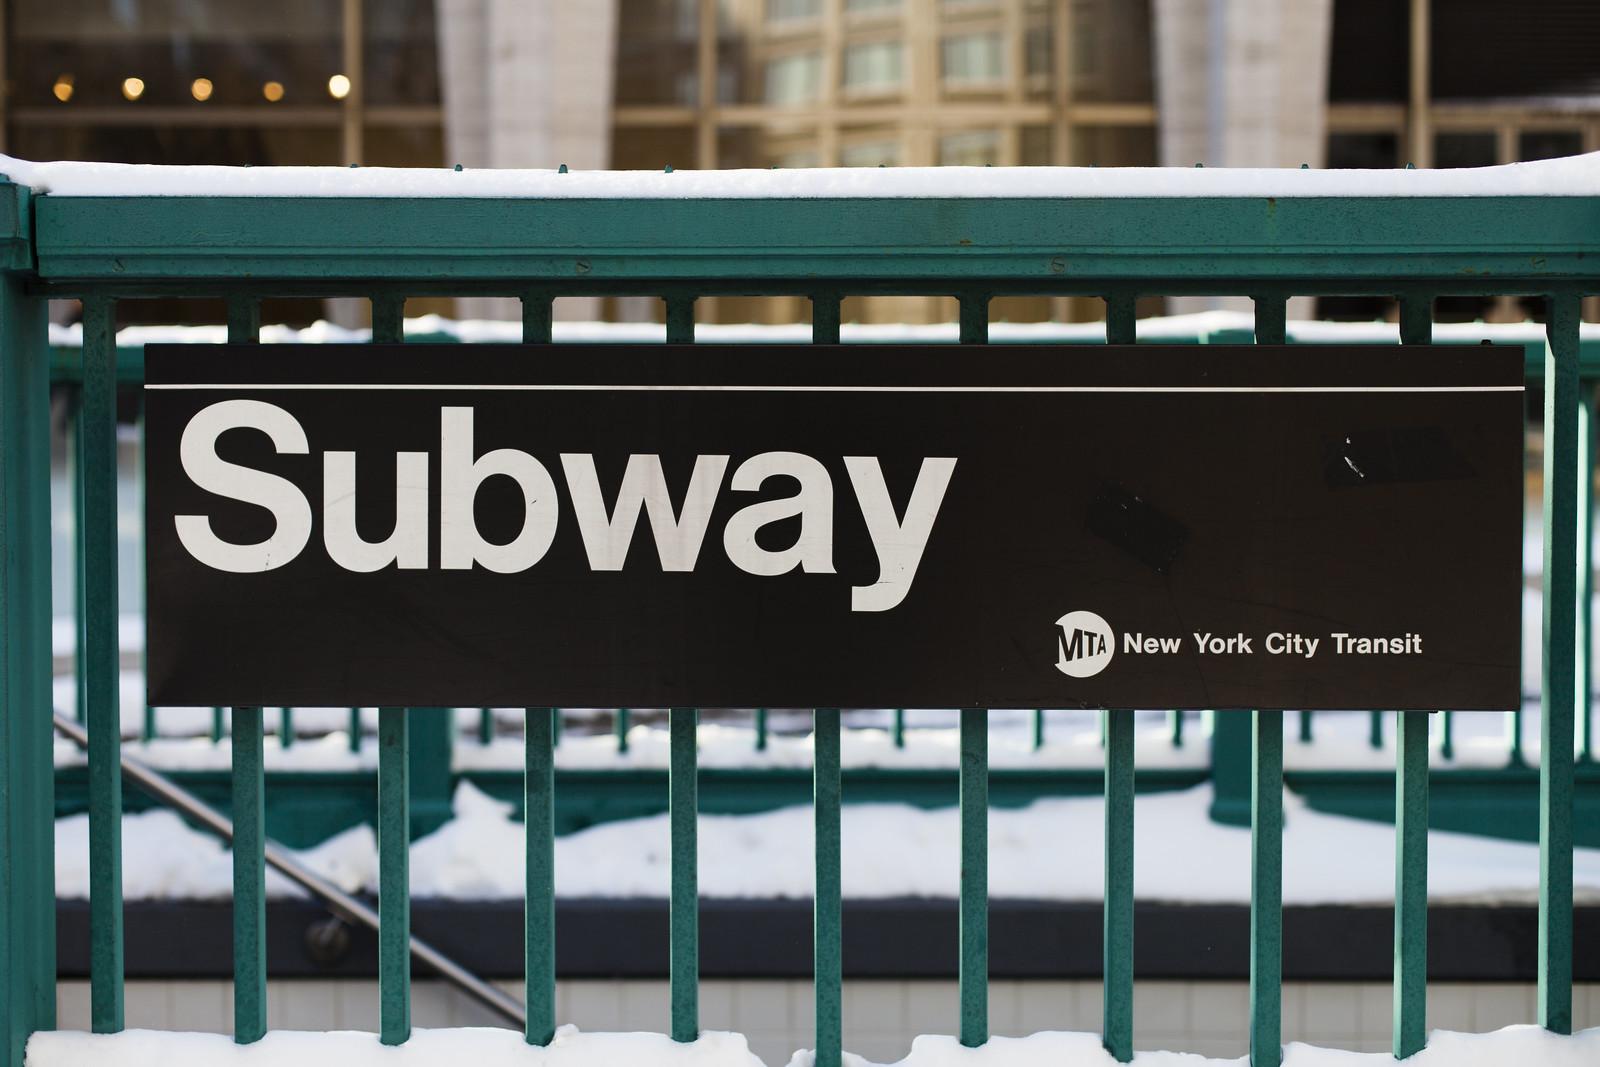 Subway Snowday by wwward0